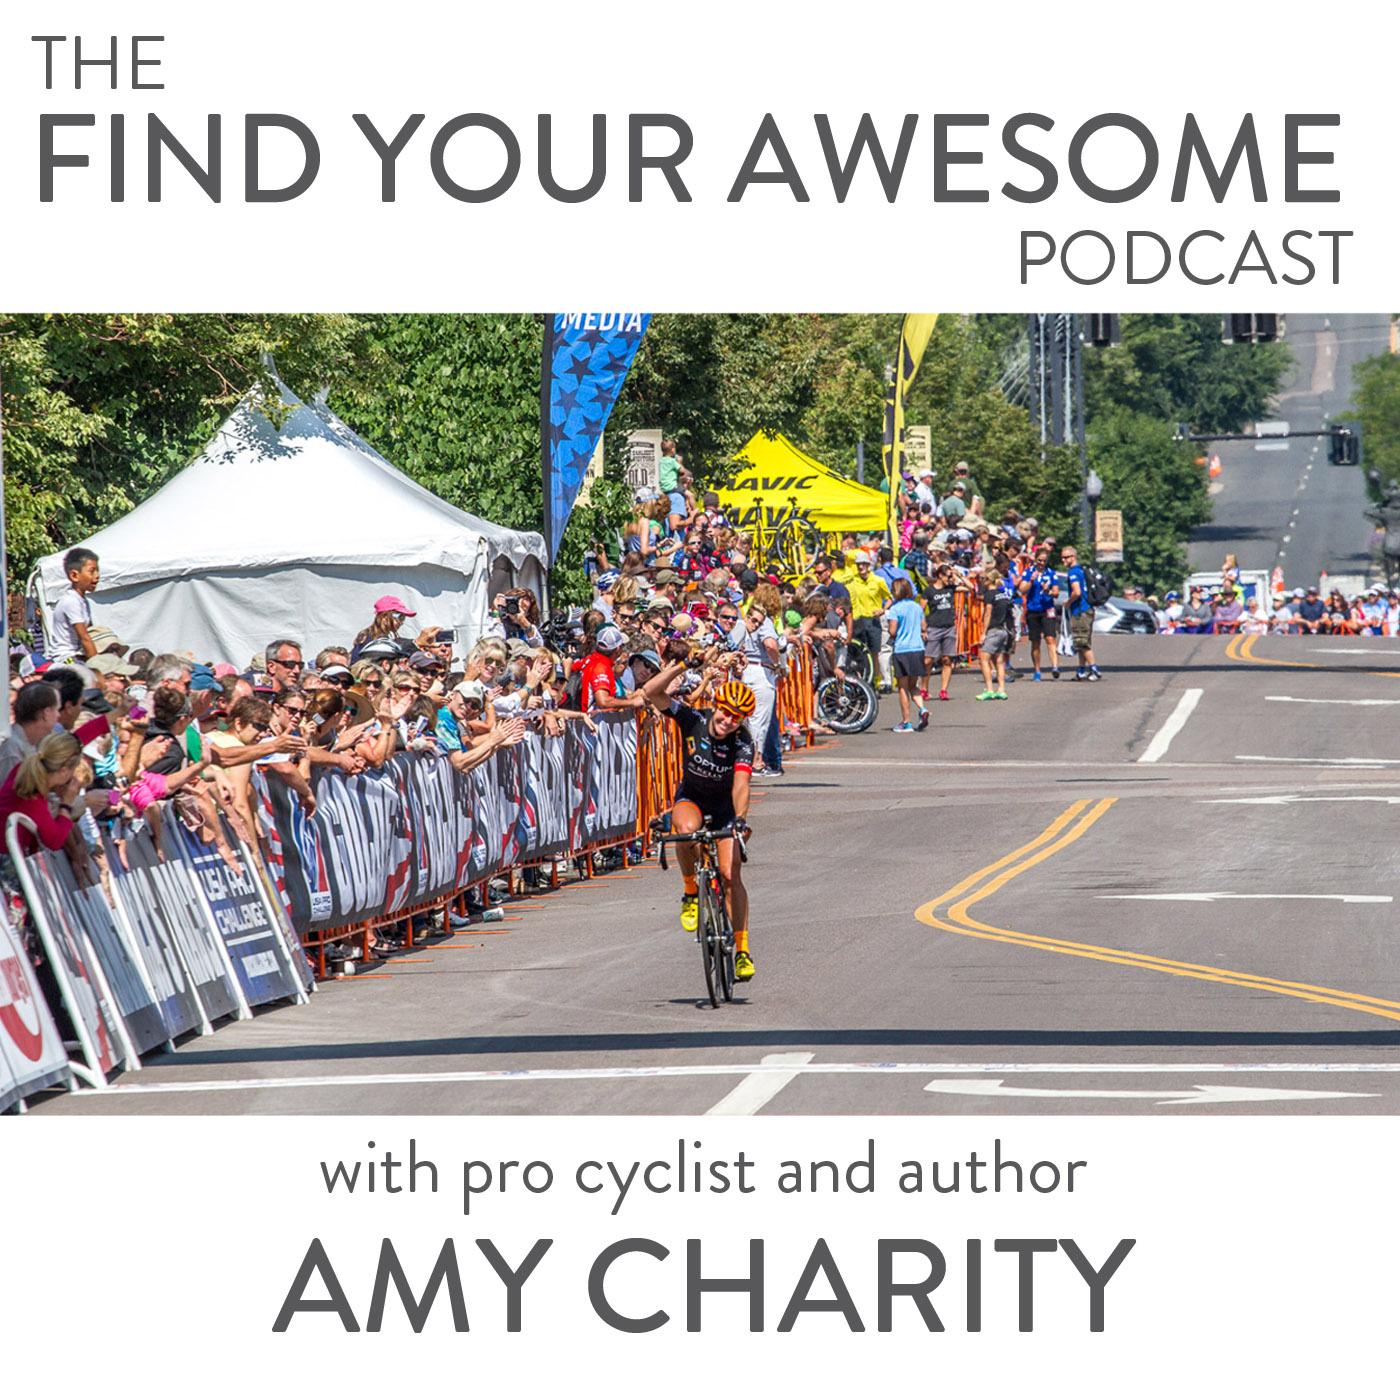 AmyCharity_podcast_coverart.jpg